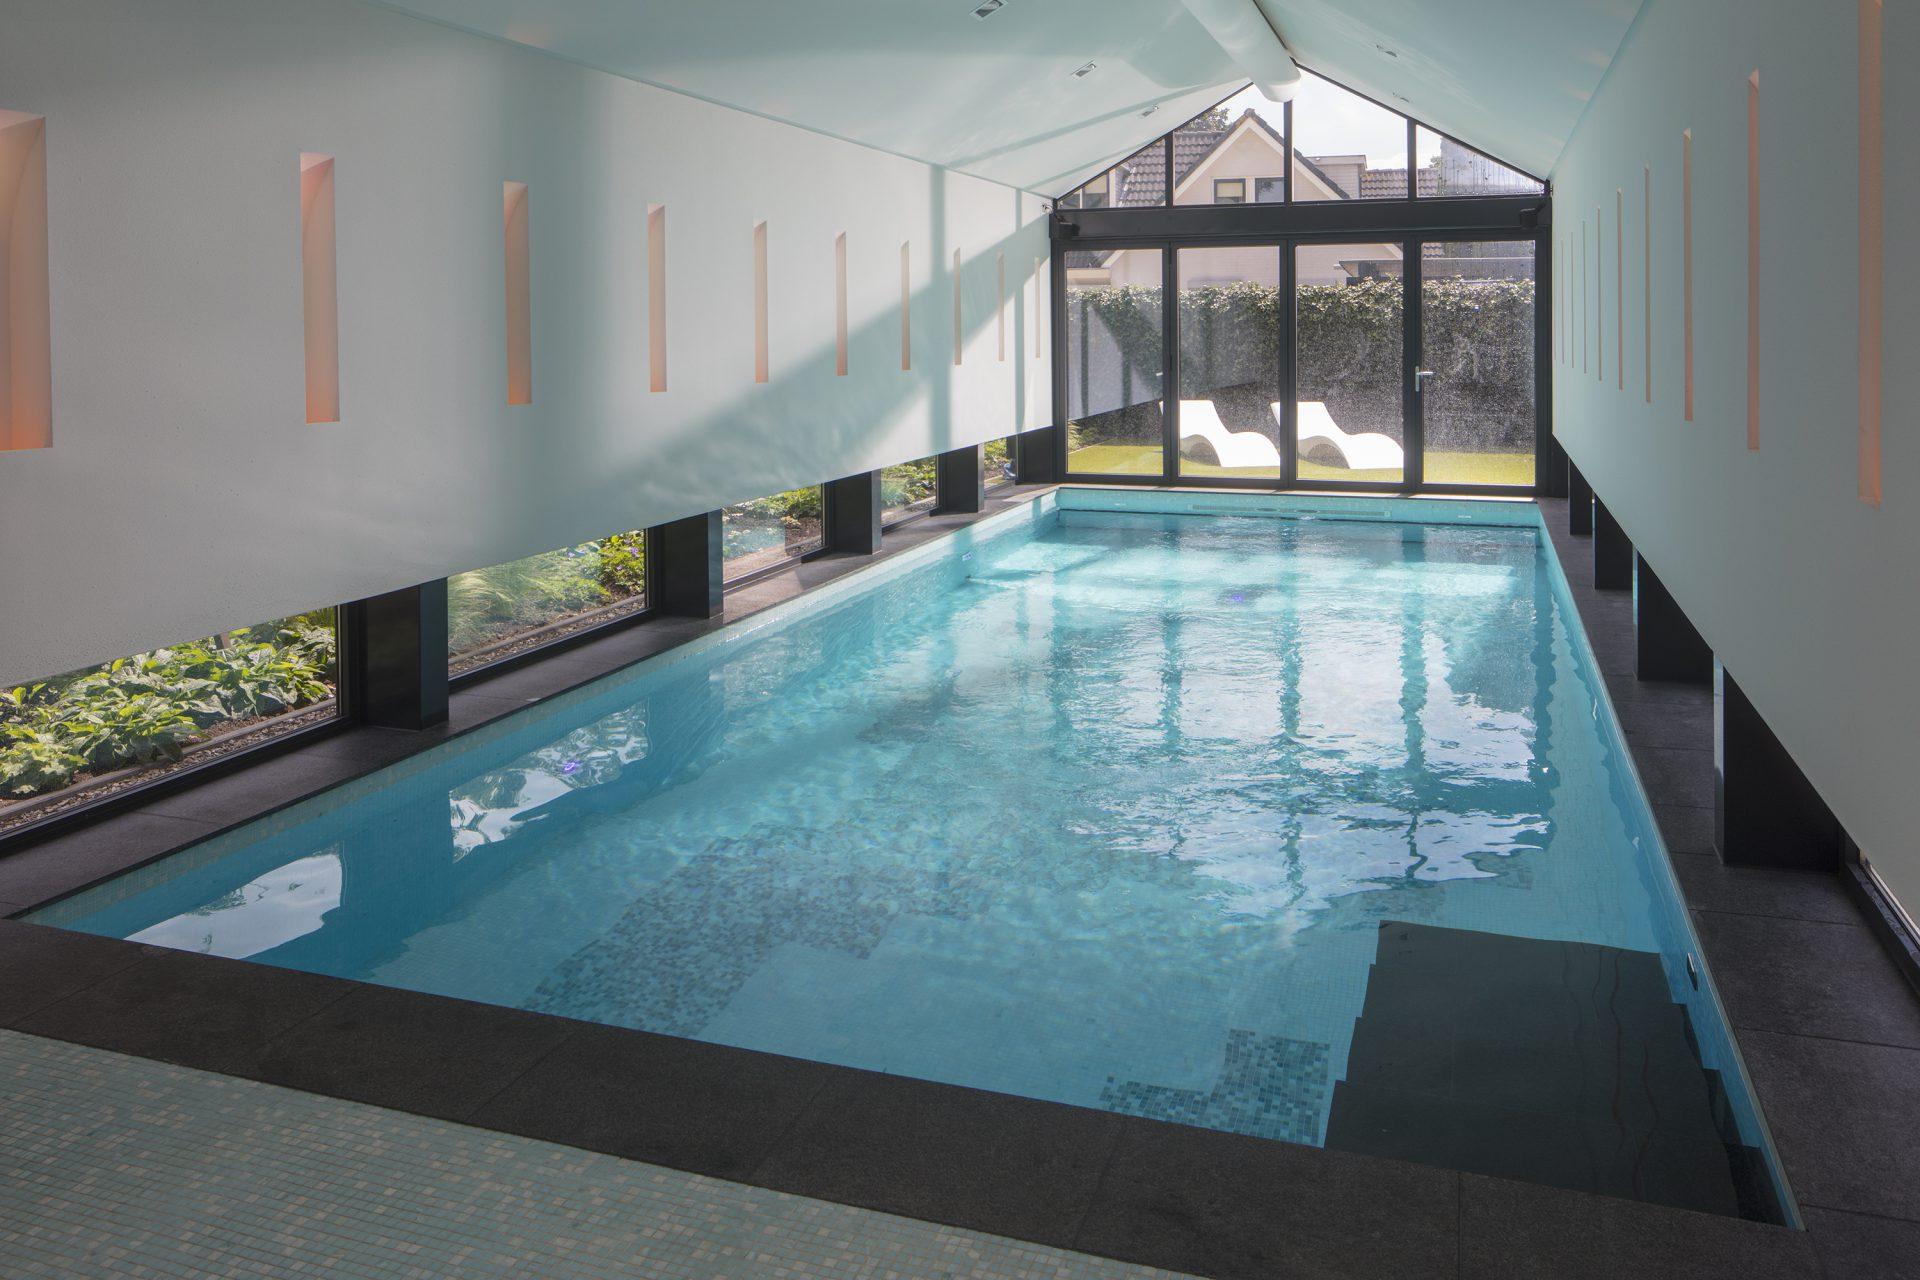 Binnenzwembad Bos Zwembaden